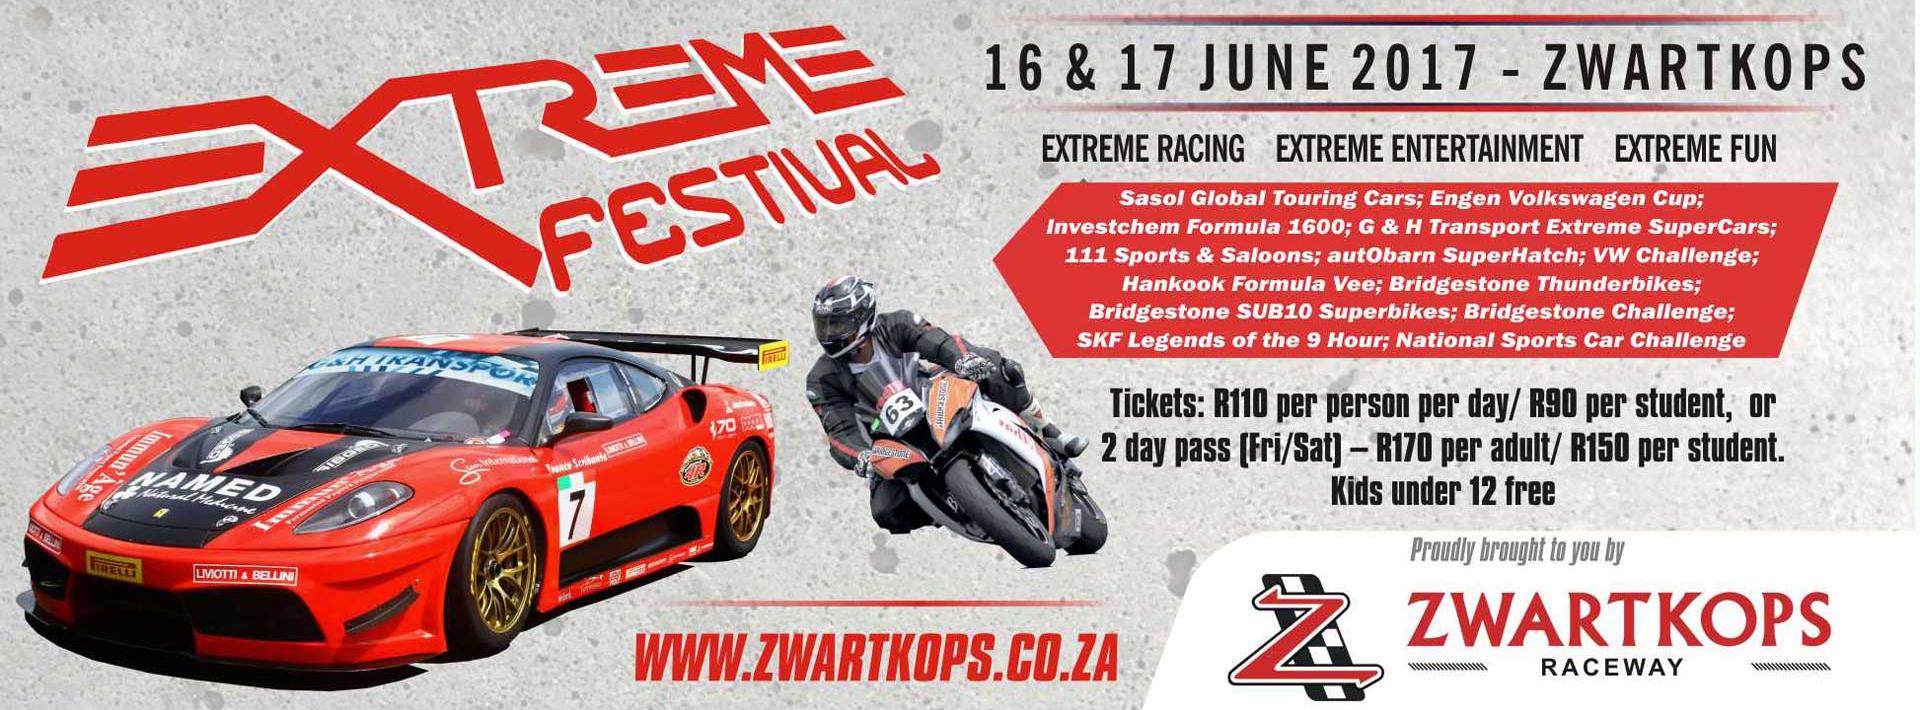 Extreme Festival - 16 & 17 June 2017